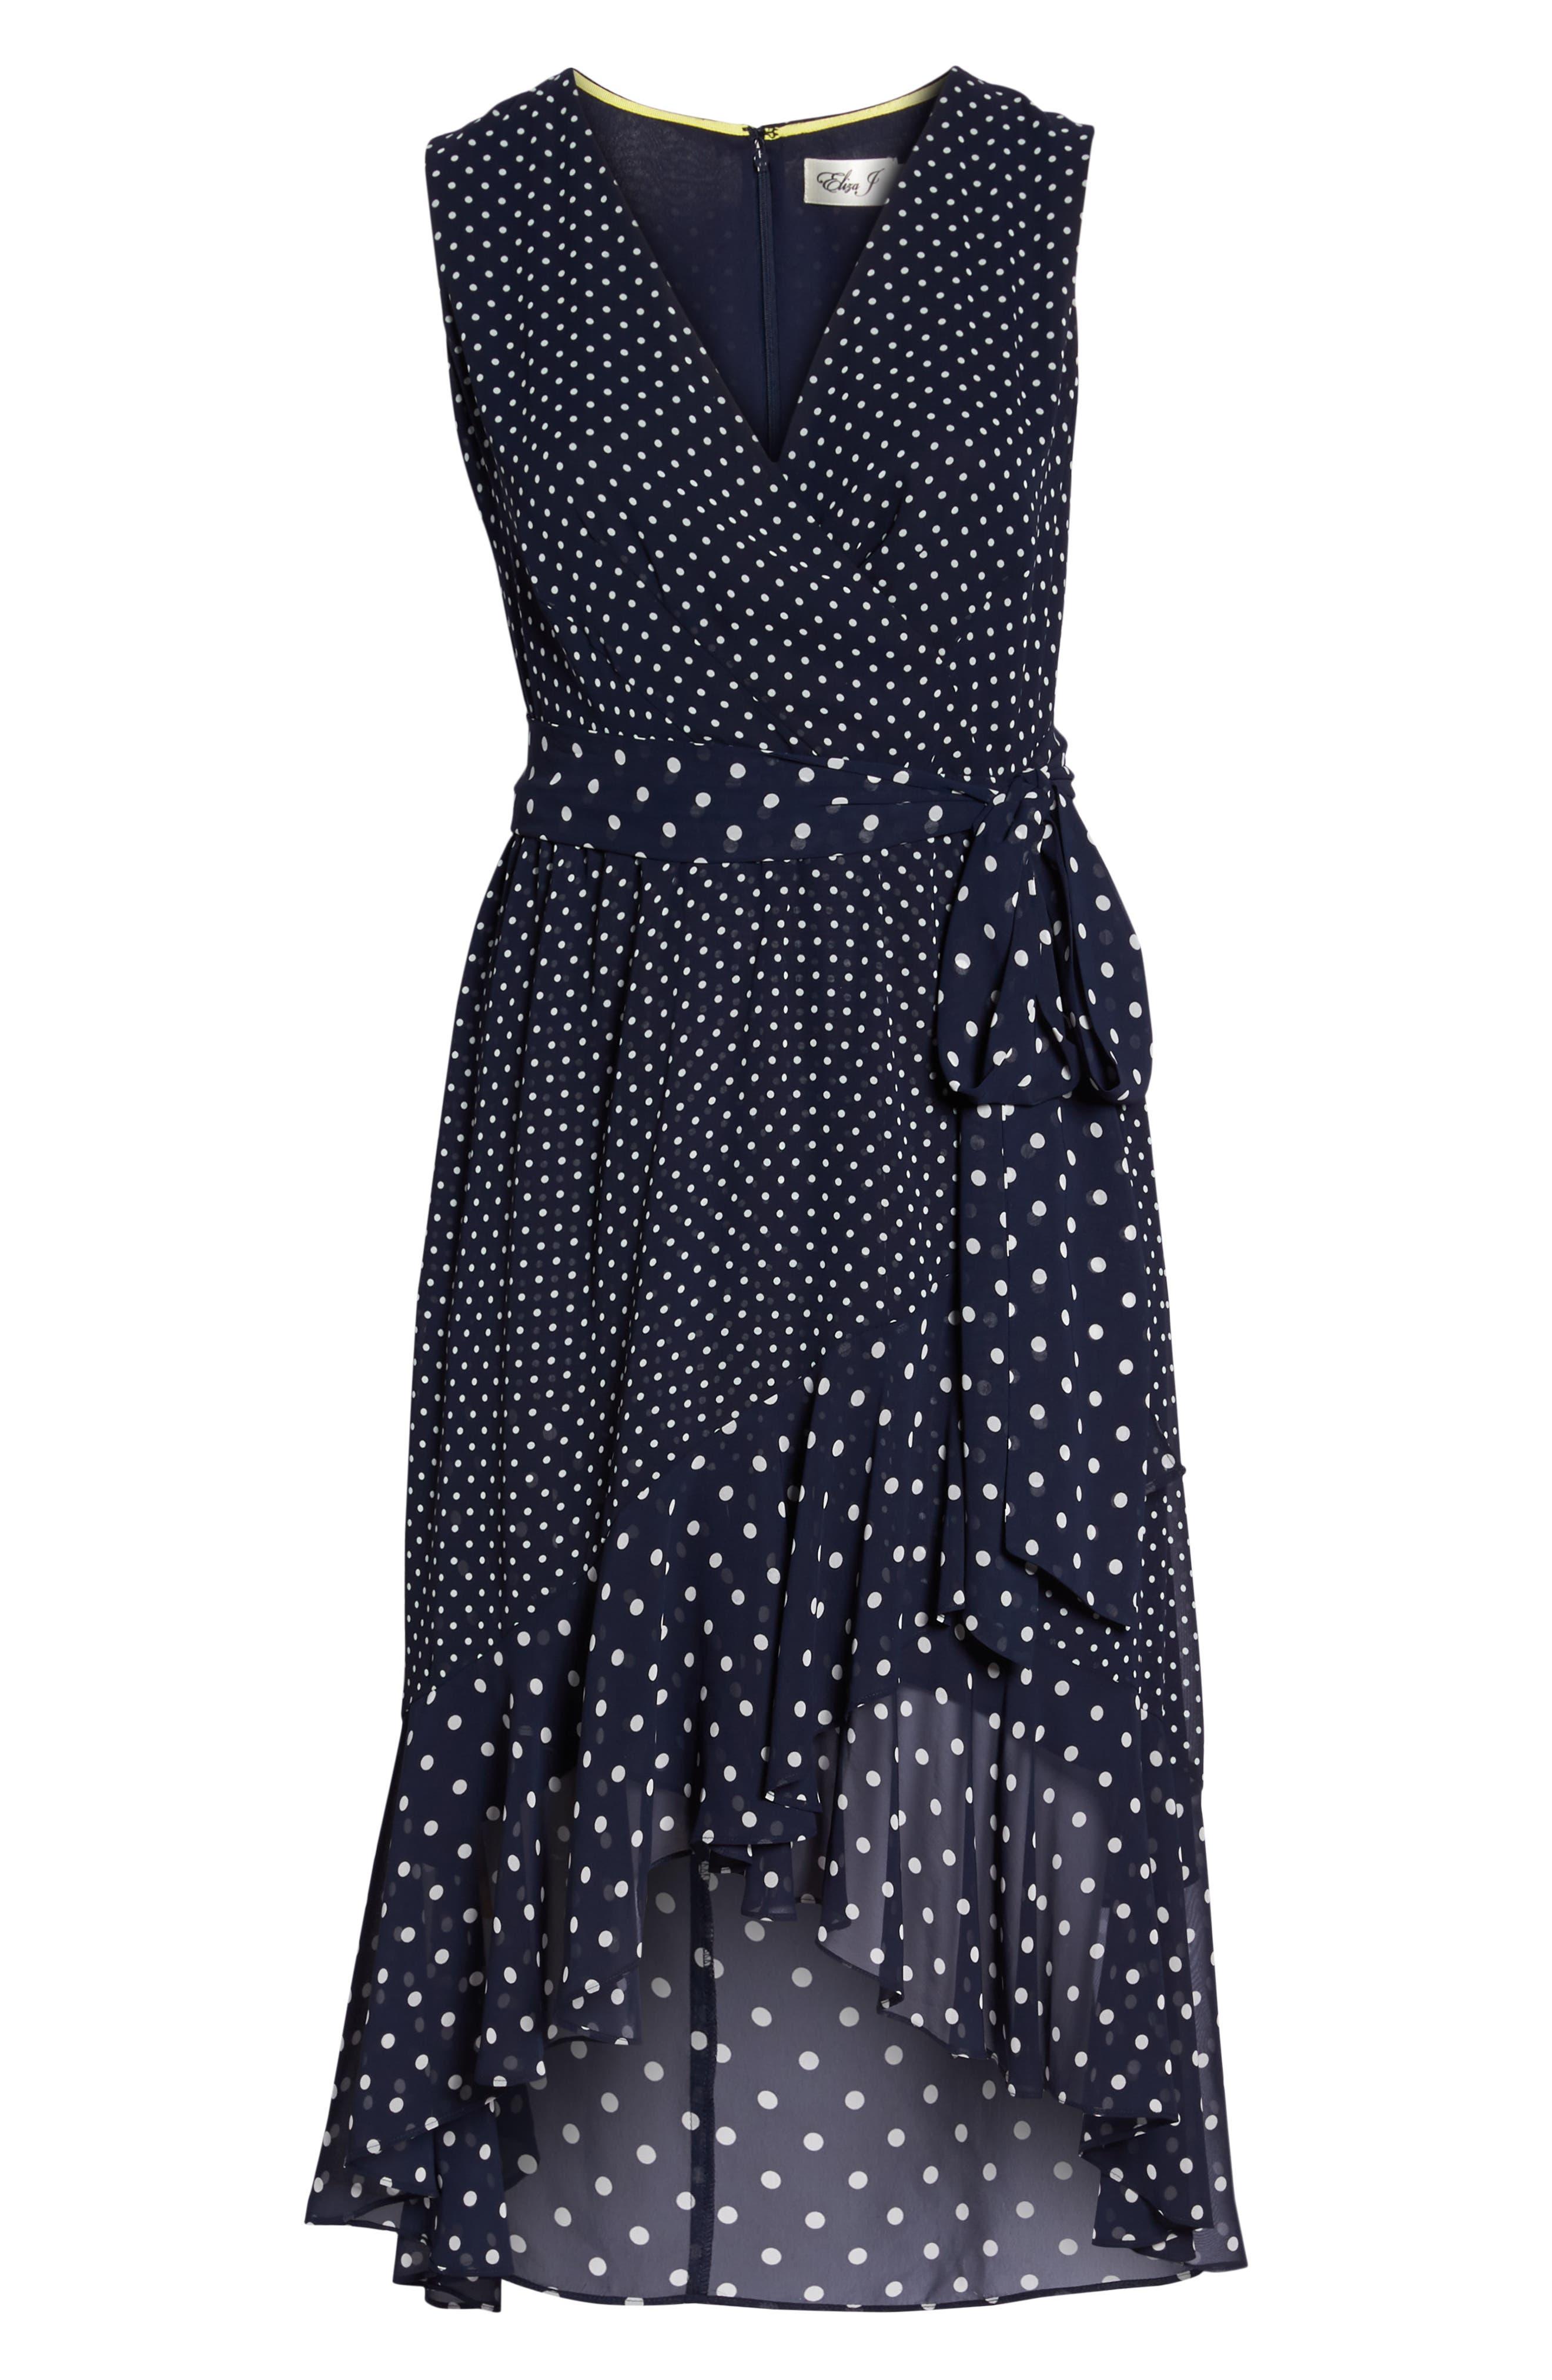 Polka Dot High/Low Hem Dress,                             Alternate thumbnail 7, color,                             Navy/ Ivory